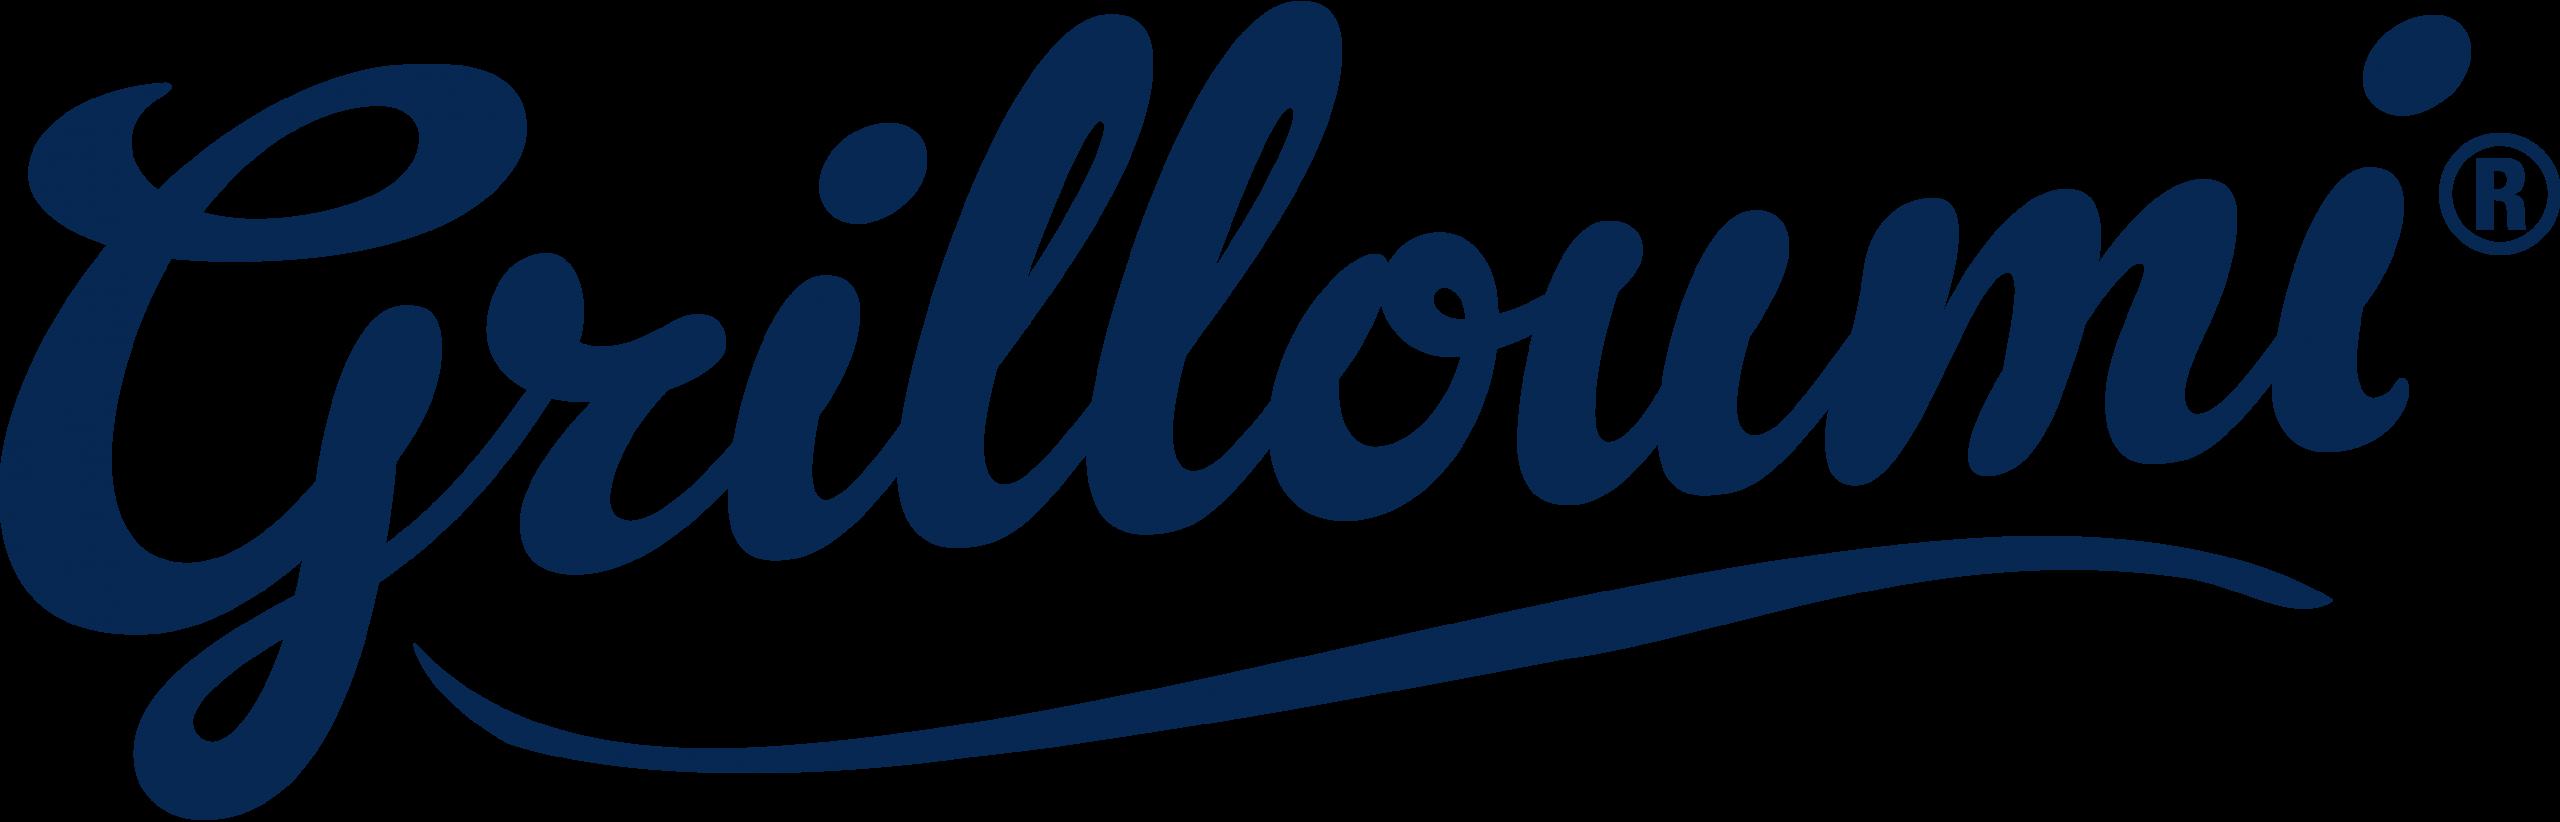 Grilloumi Logo